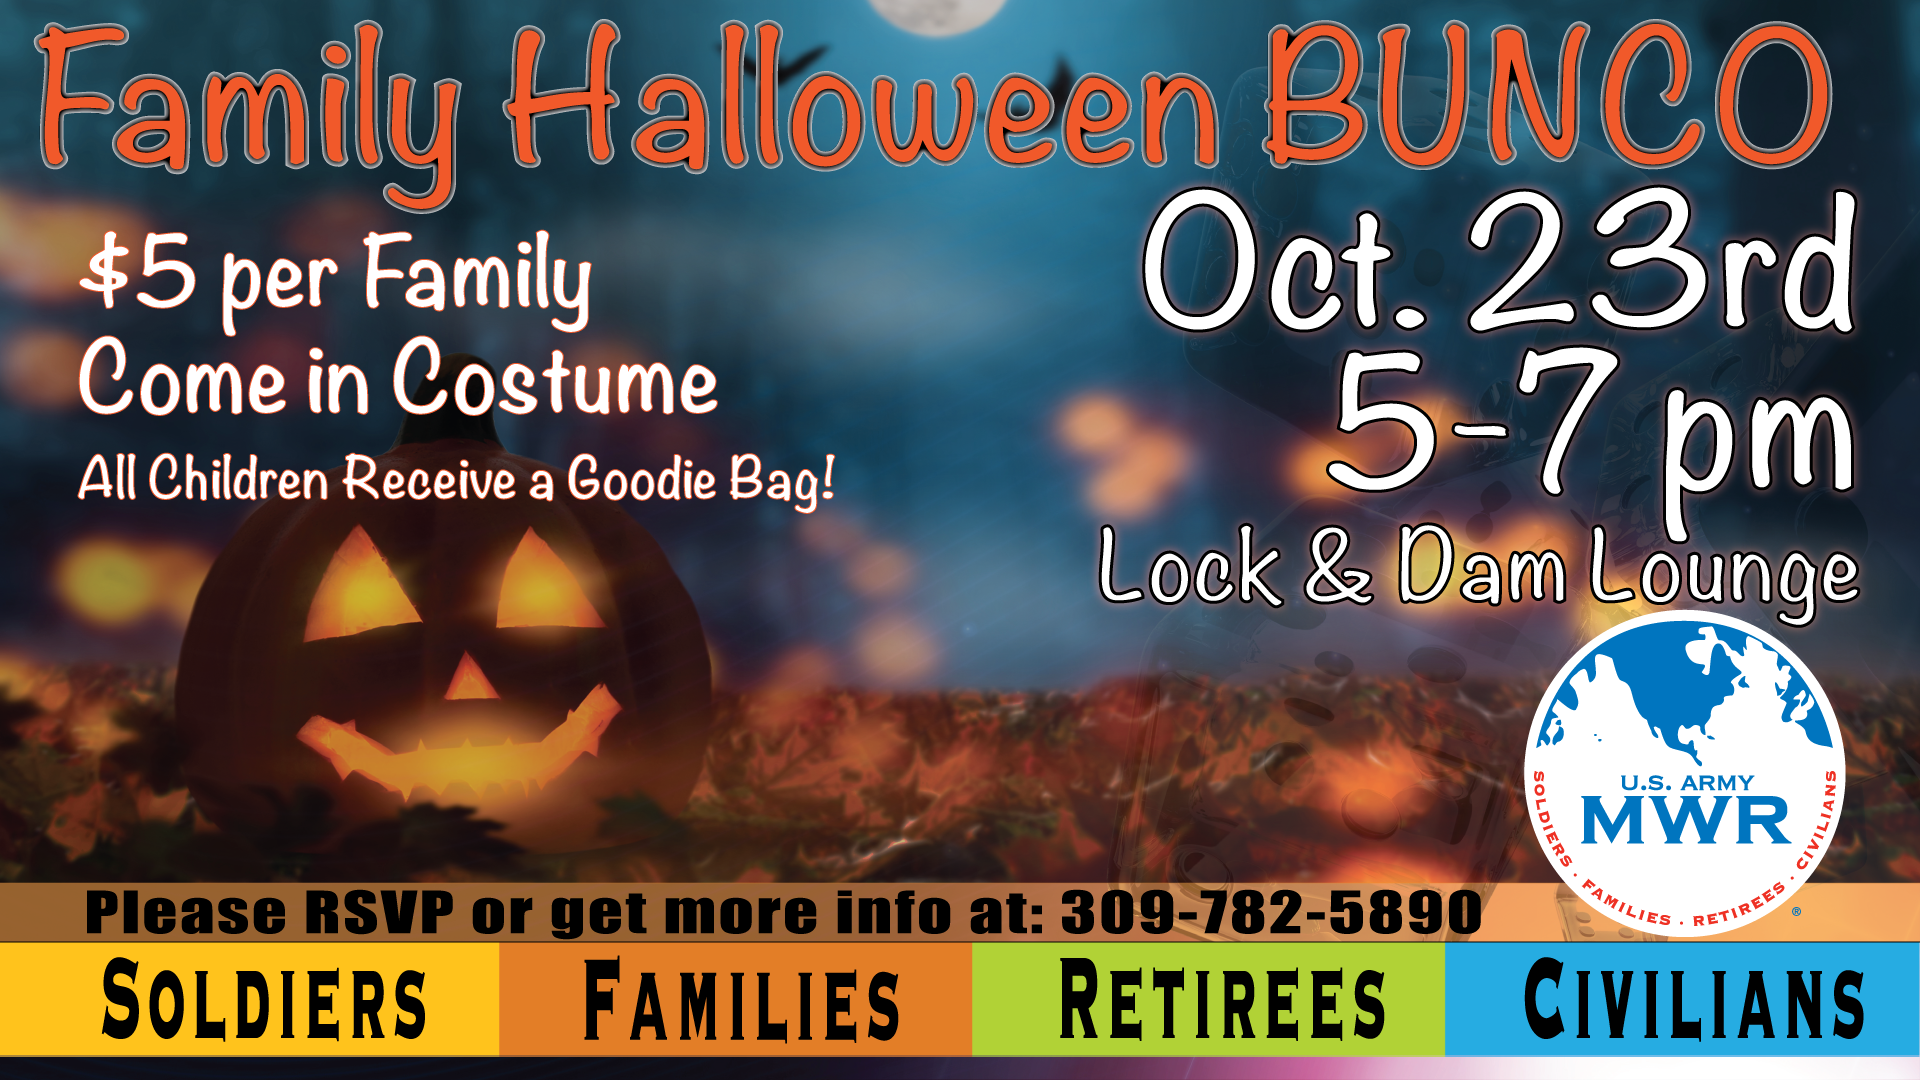 Family Halloween Bunco